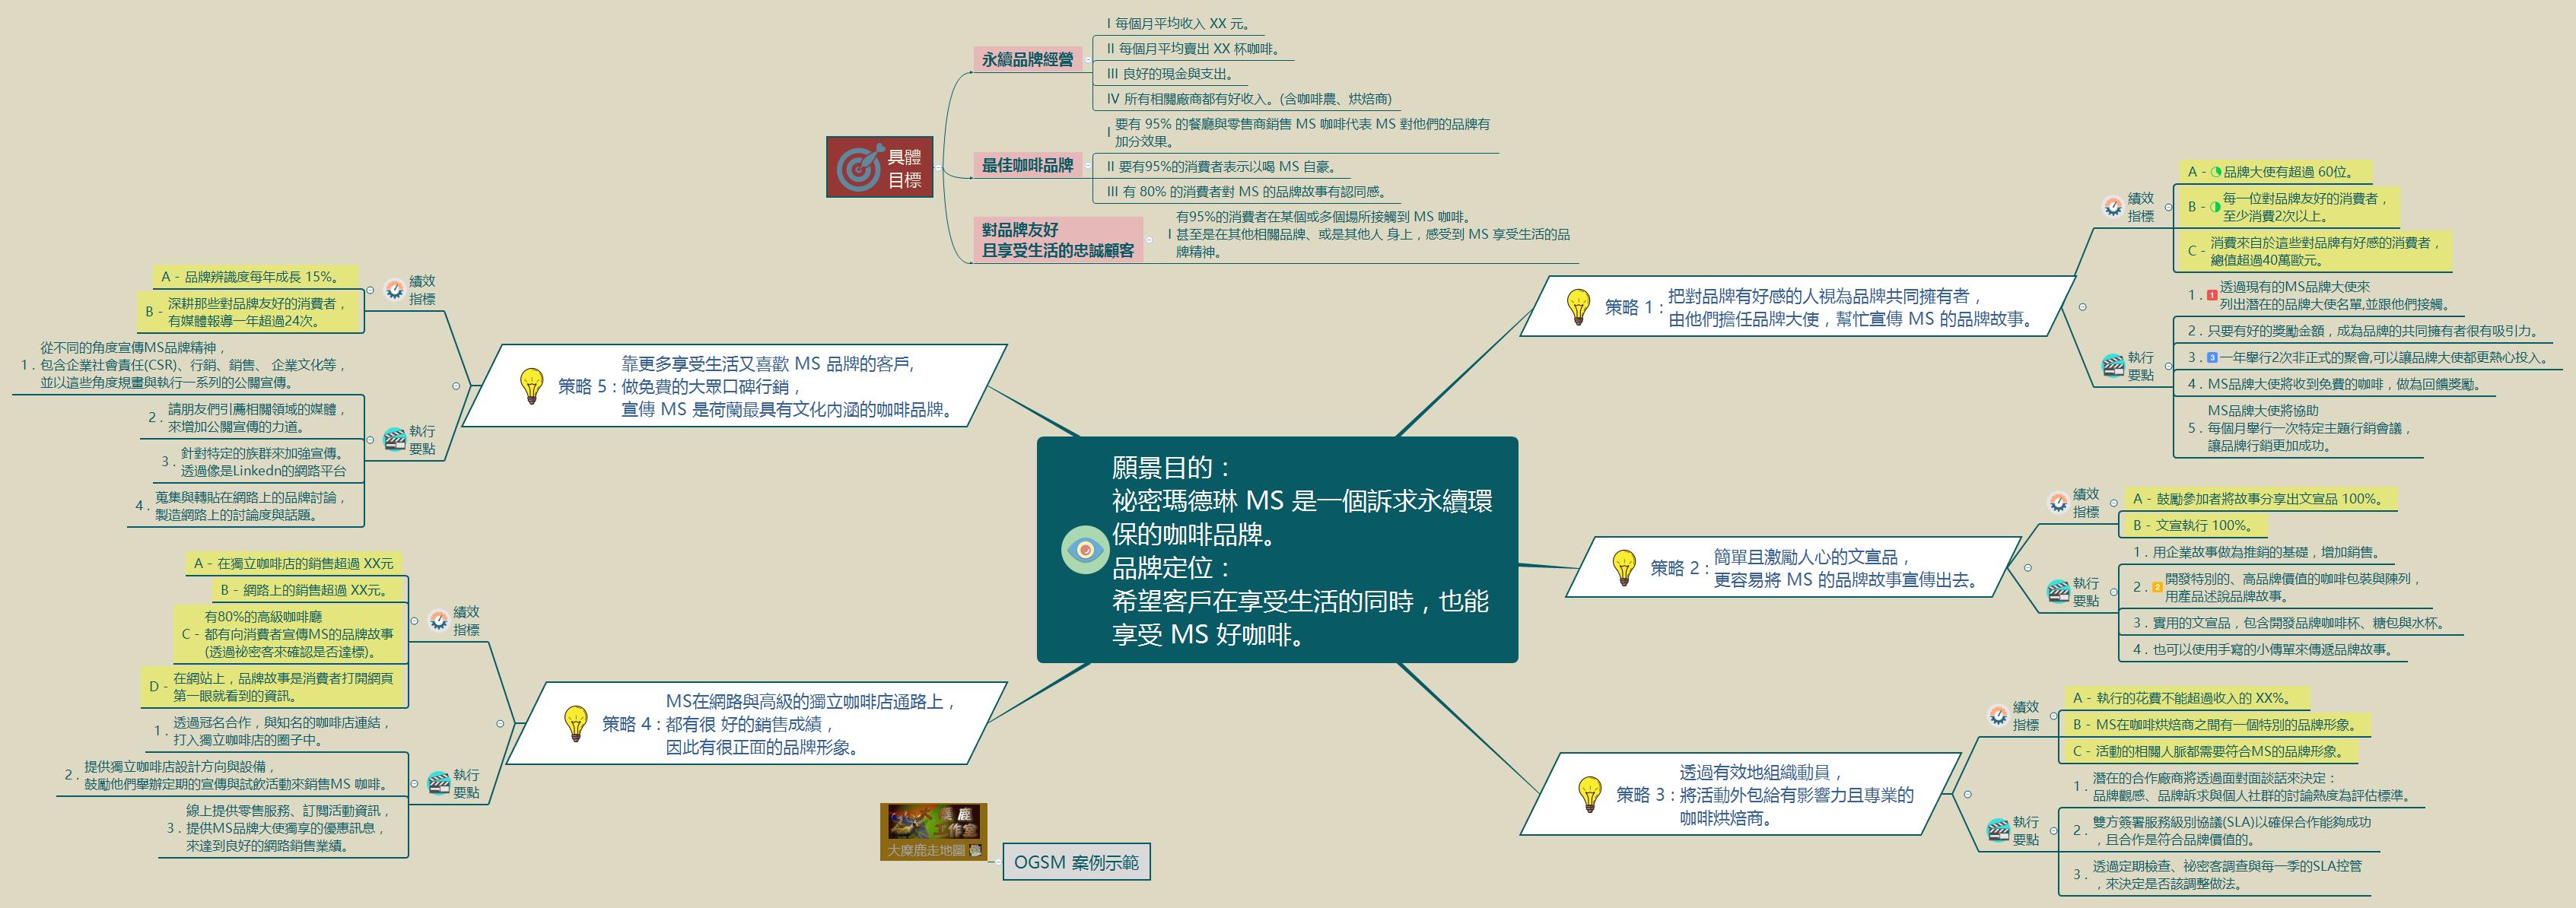 OGSM經營策略計畫案例示範